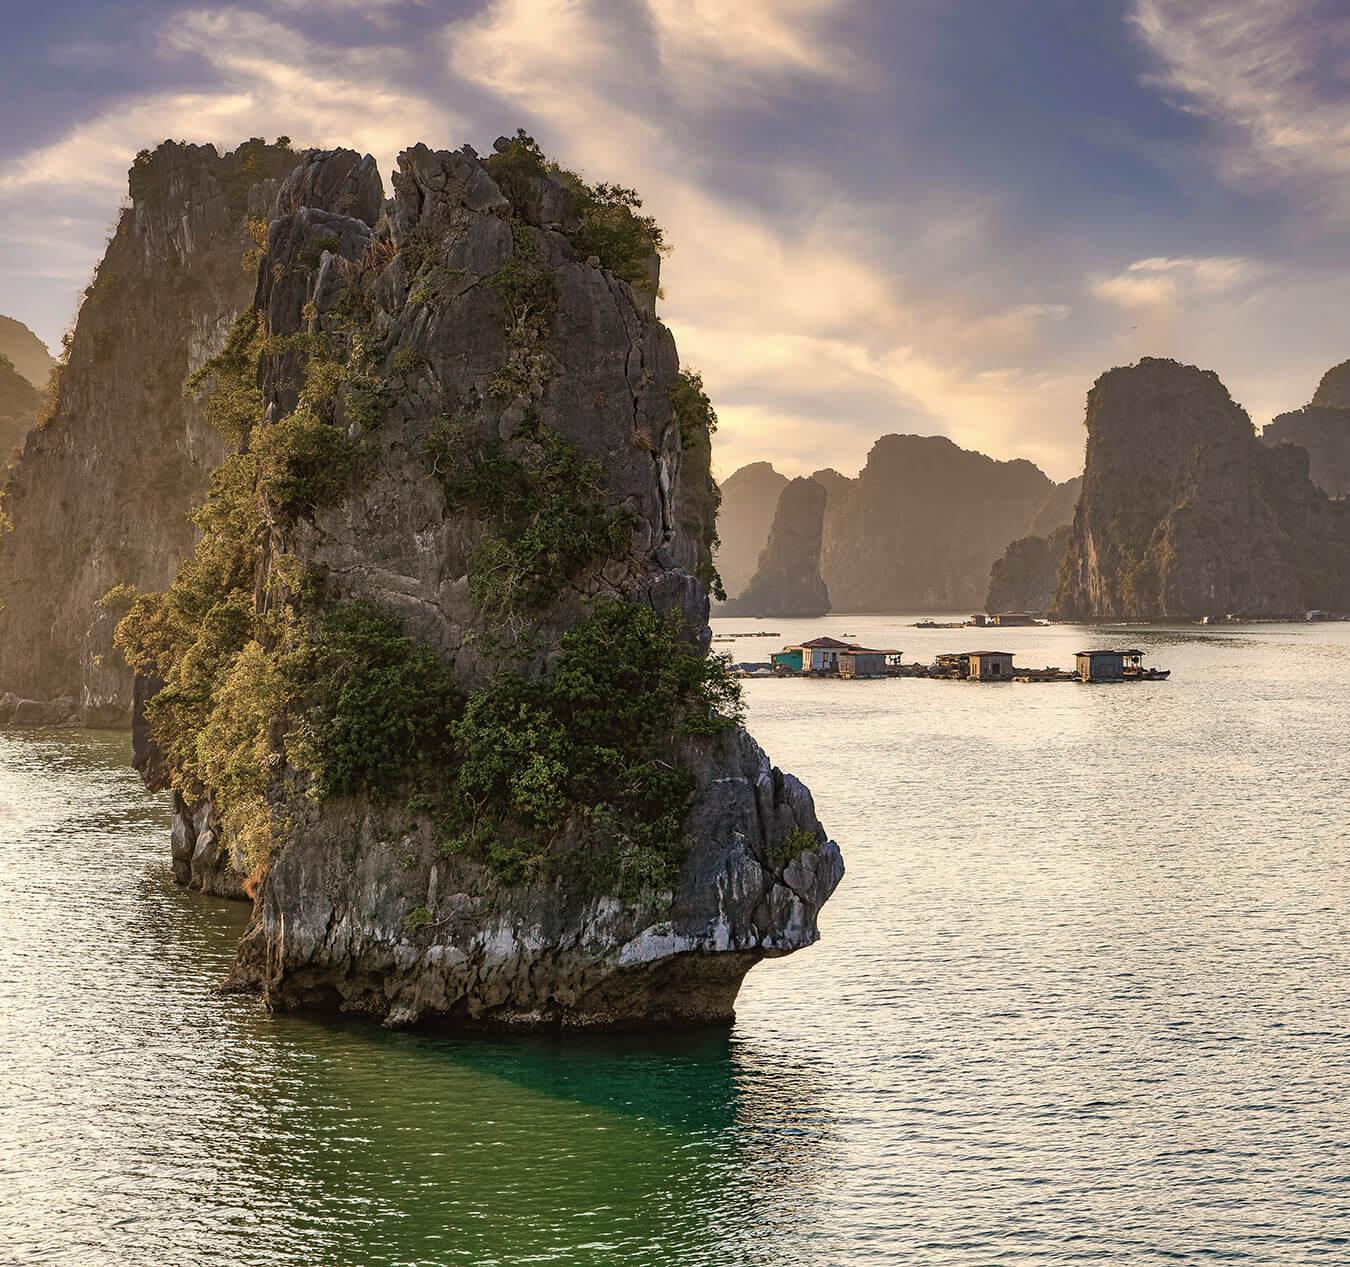 Spectacular rock formations in Lan Ha Bay, Vietnam